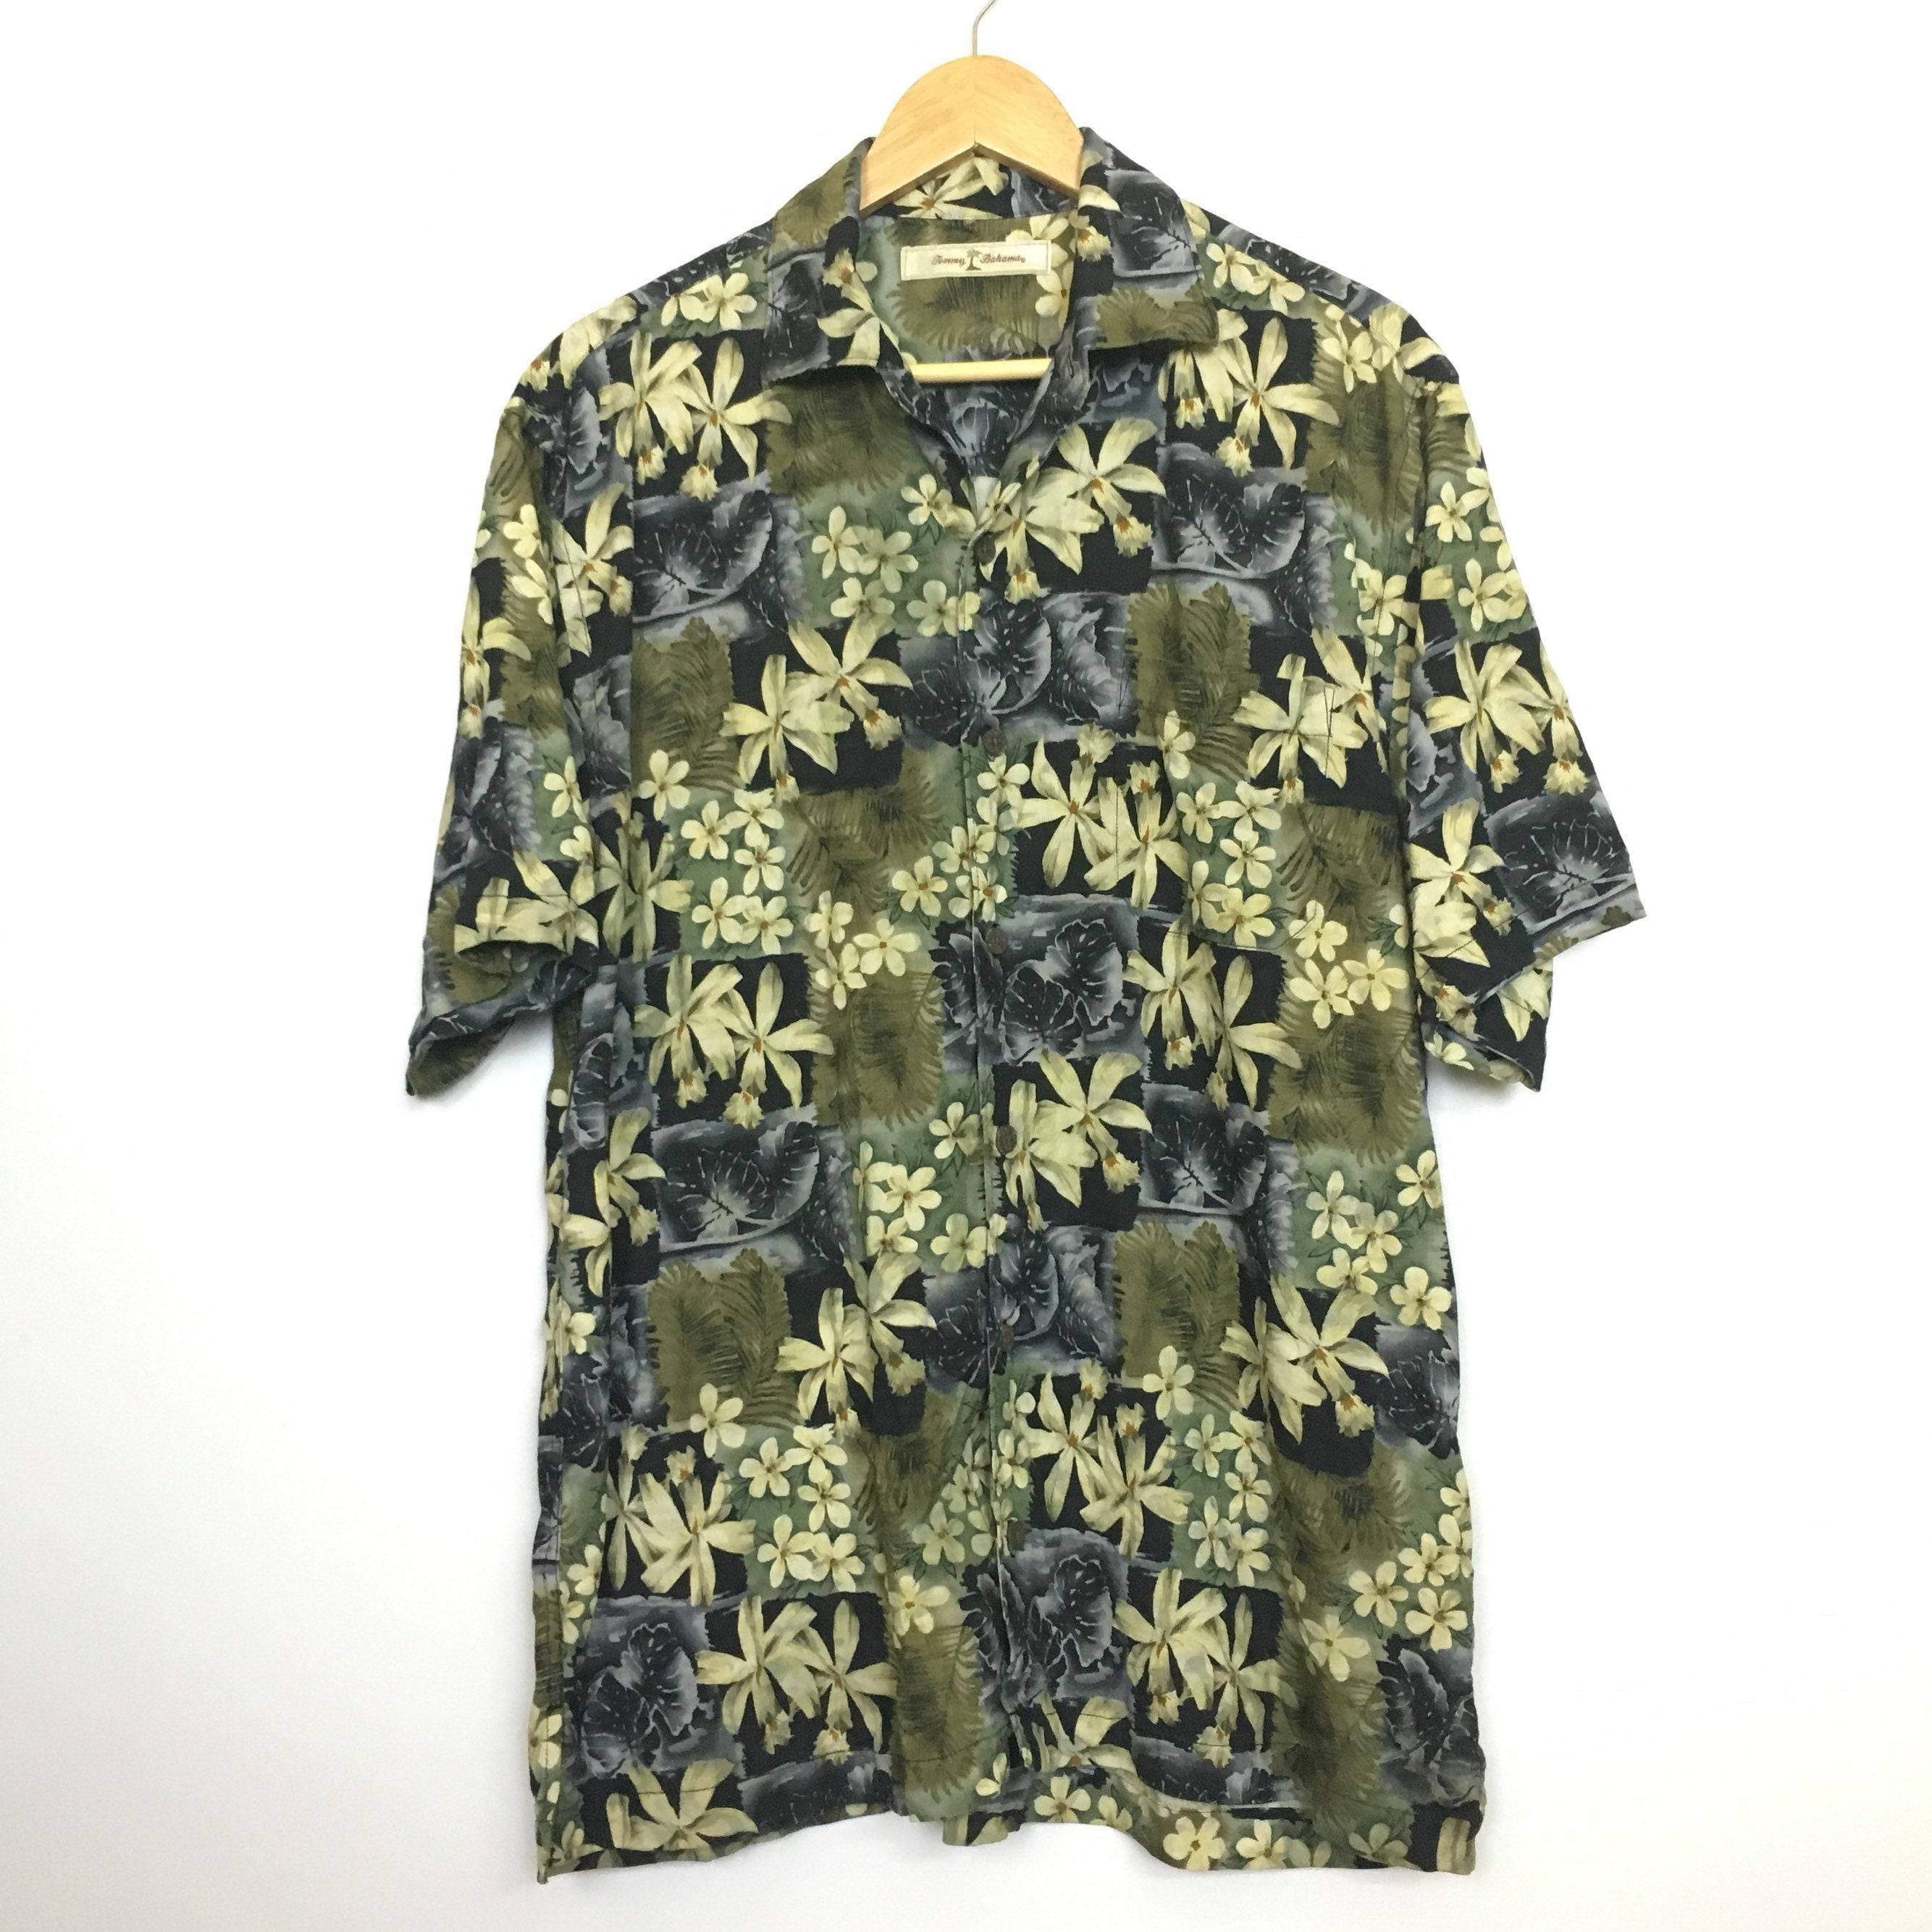 c0af5a6c Tommy Bahama Aloha Floral Hawaiian Tropical Rayon Shirt Size M | Etsy